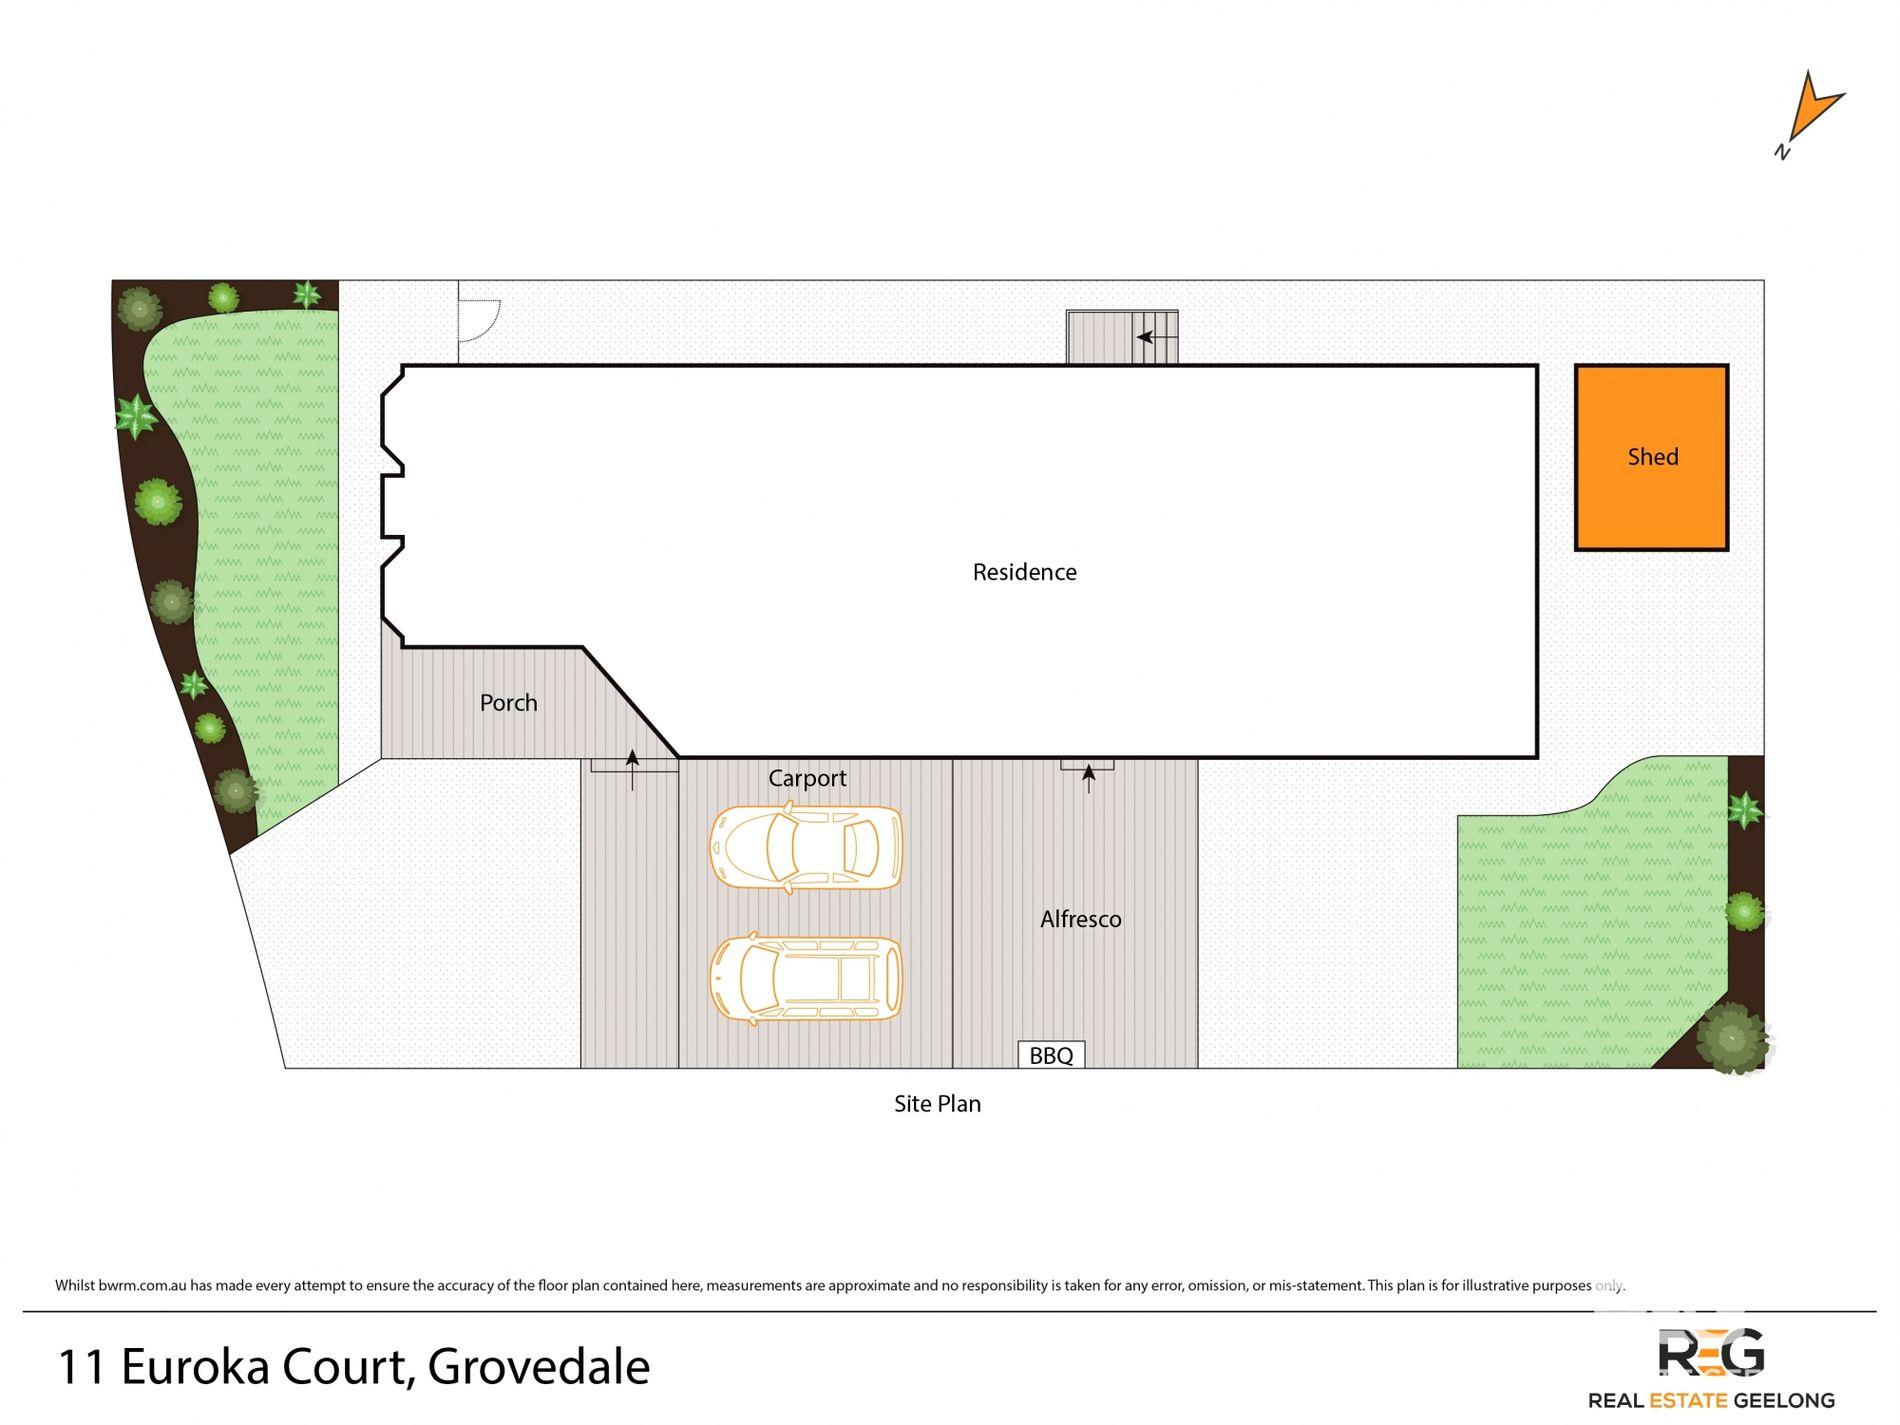 11 EUROKA COURT, Grovedale